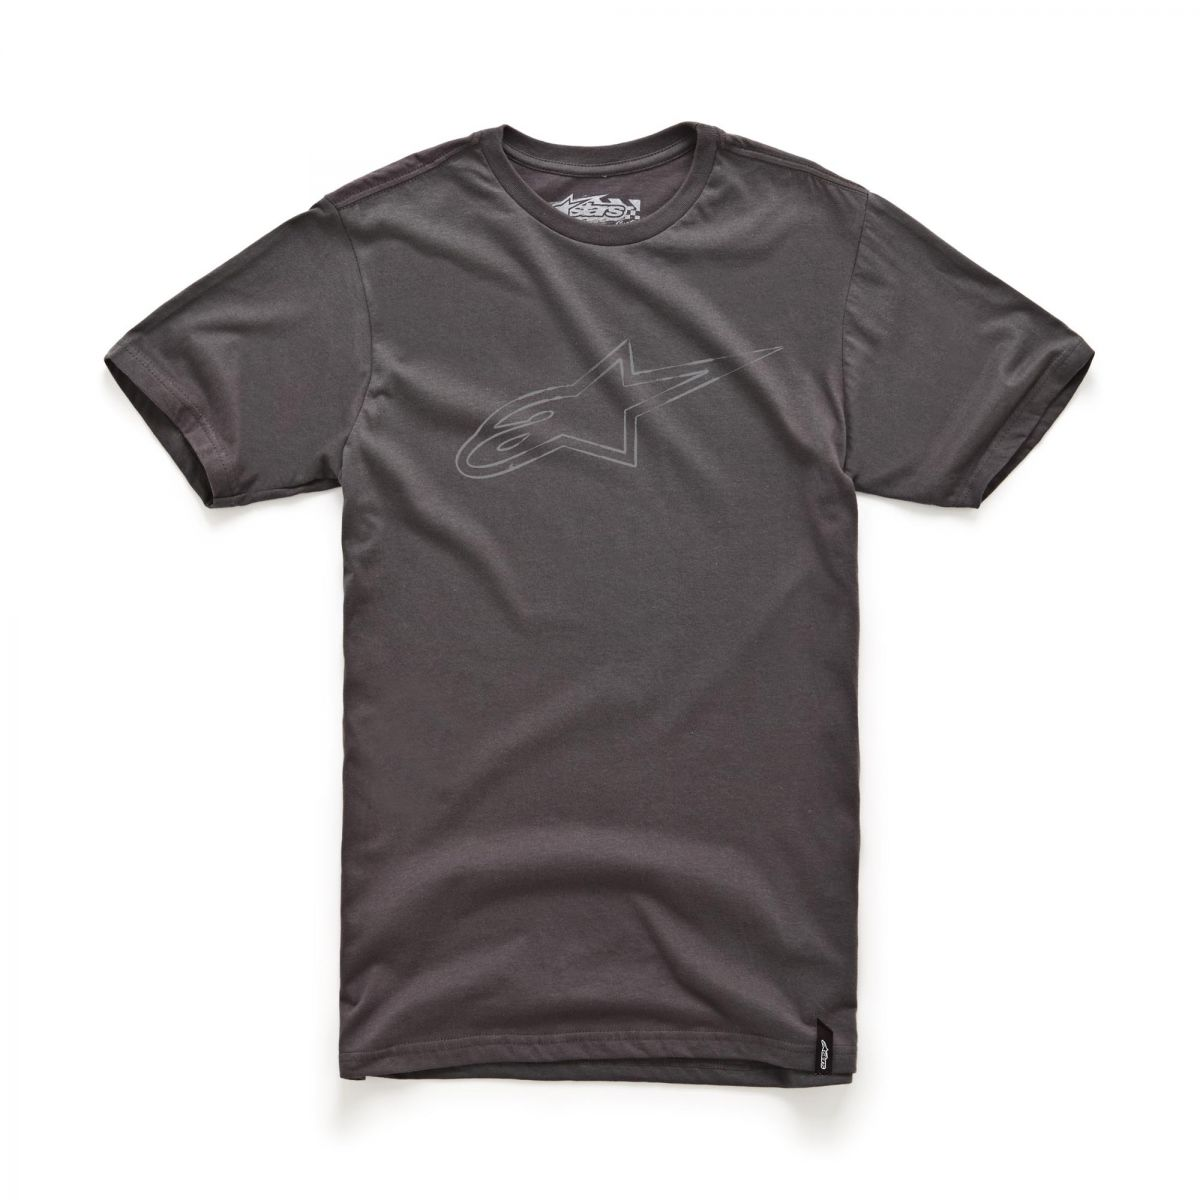 Camiseta Alpinestars Arboretum (Grafite)  - Super Bike - Loja Oficial Alpinestars